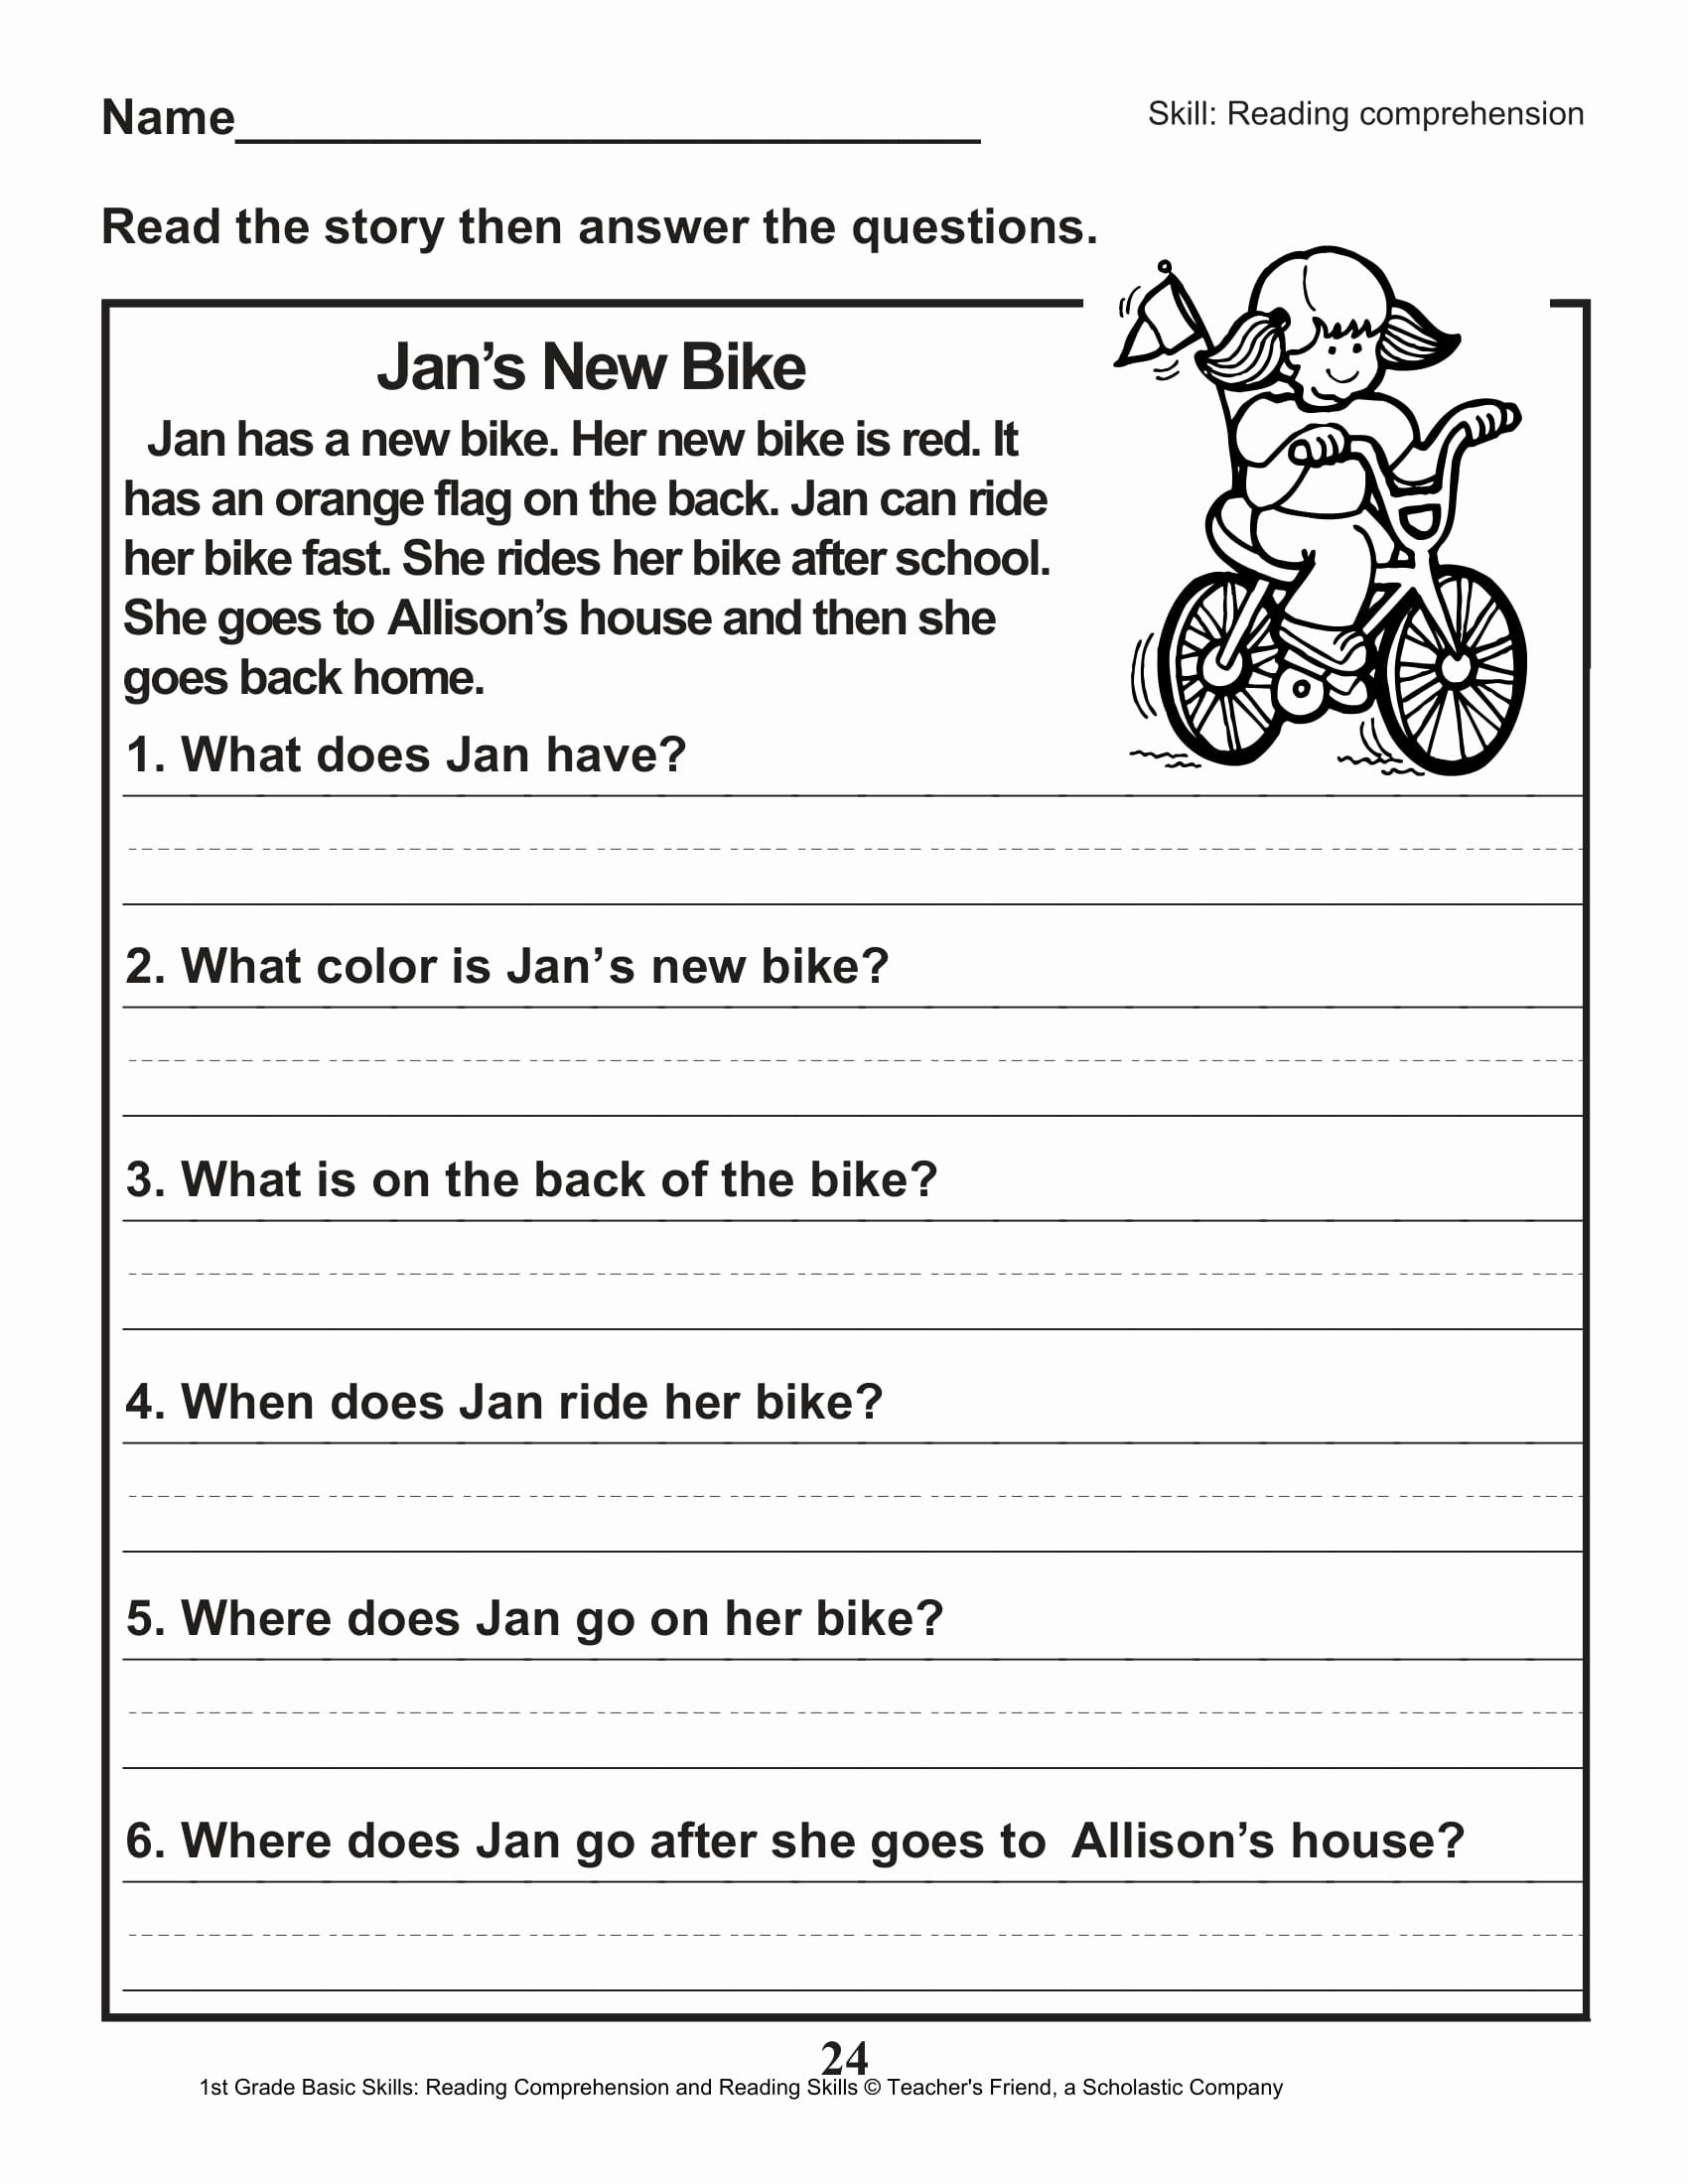 Comprehension Worksheet First Grade Inspirational 40 Scholastic 1st Grade Reading Prehension Skills